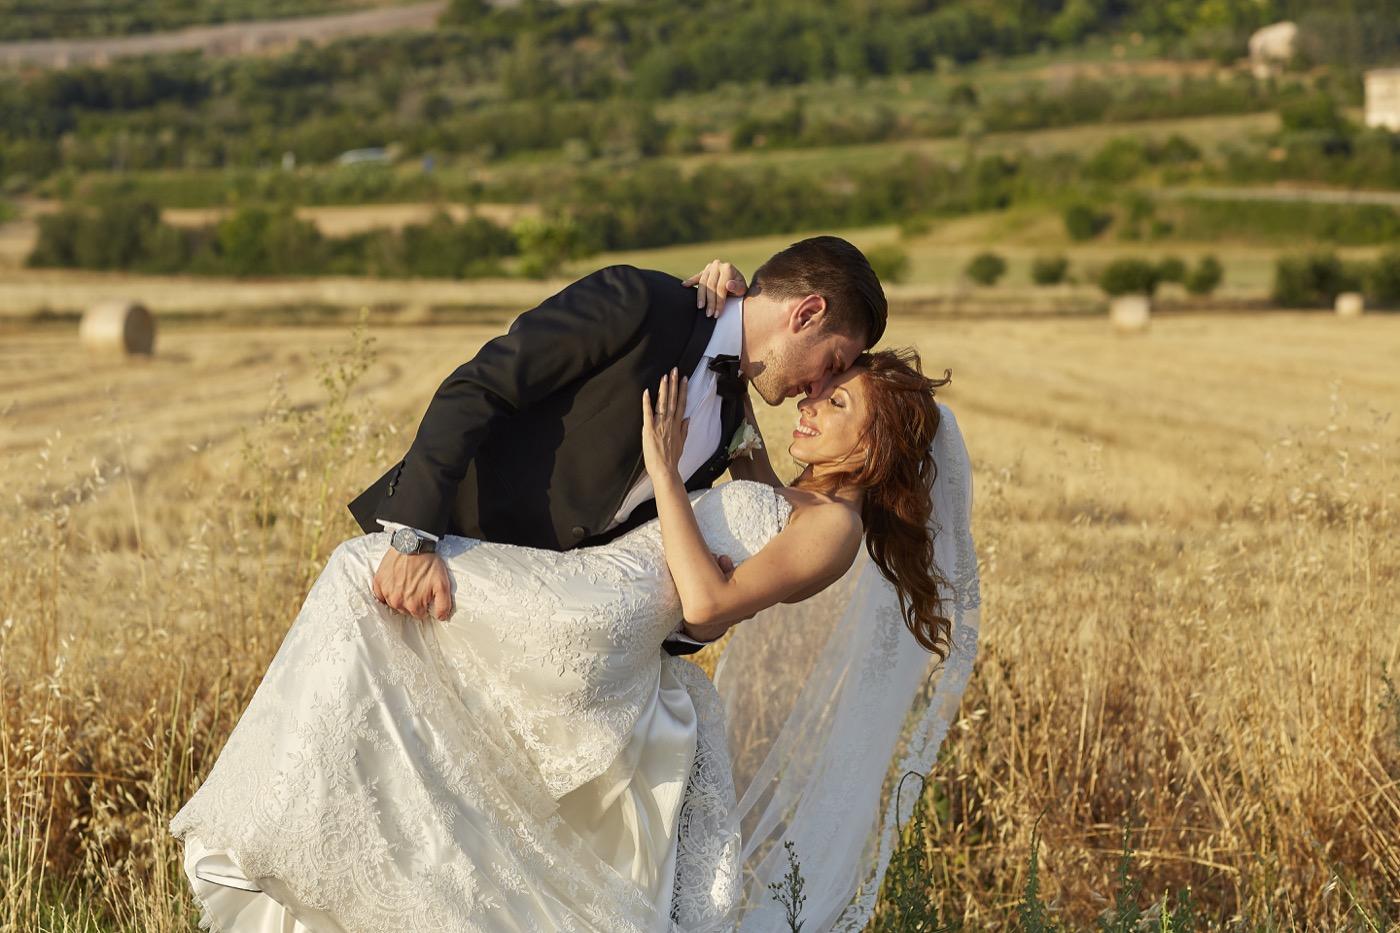 Claudio-Coppola-wedding-photographer-abbazia-7-frati-piegaro-66